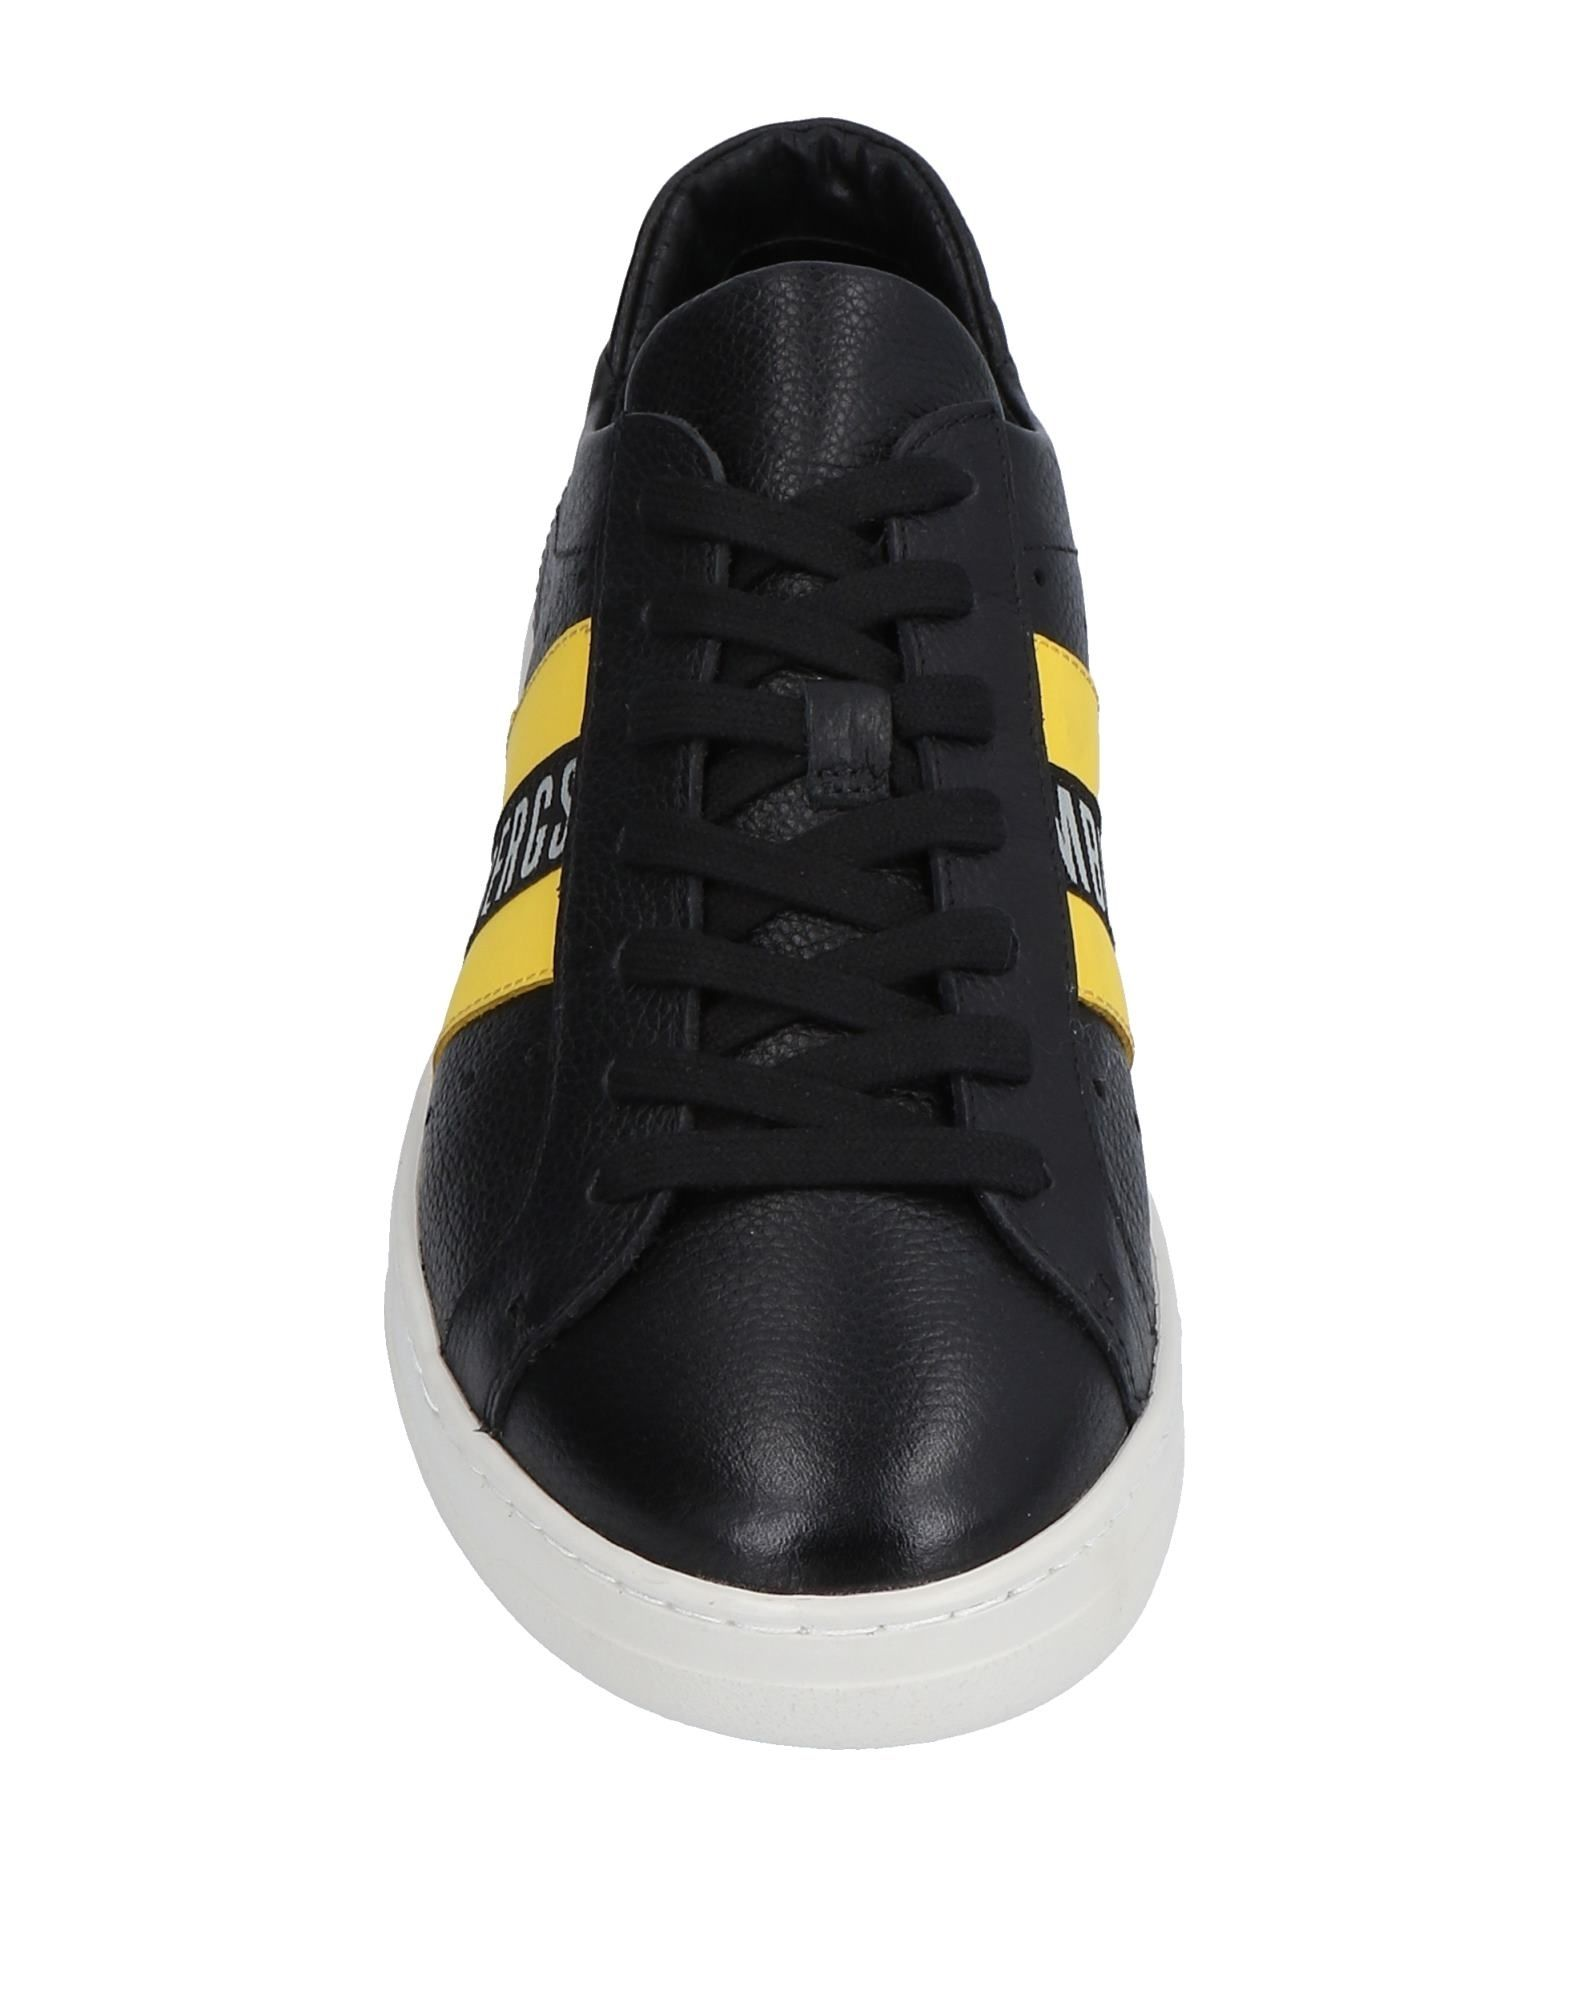 Bikkembergs Sneakers Herren  11520697VQ Gute Qualität beliebte Schuhe